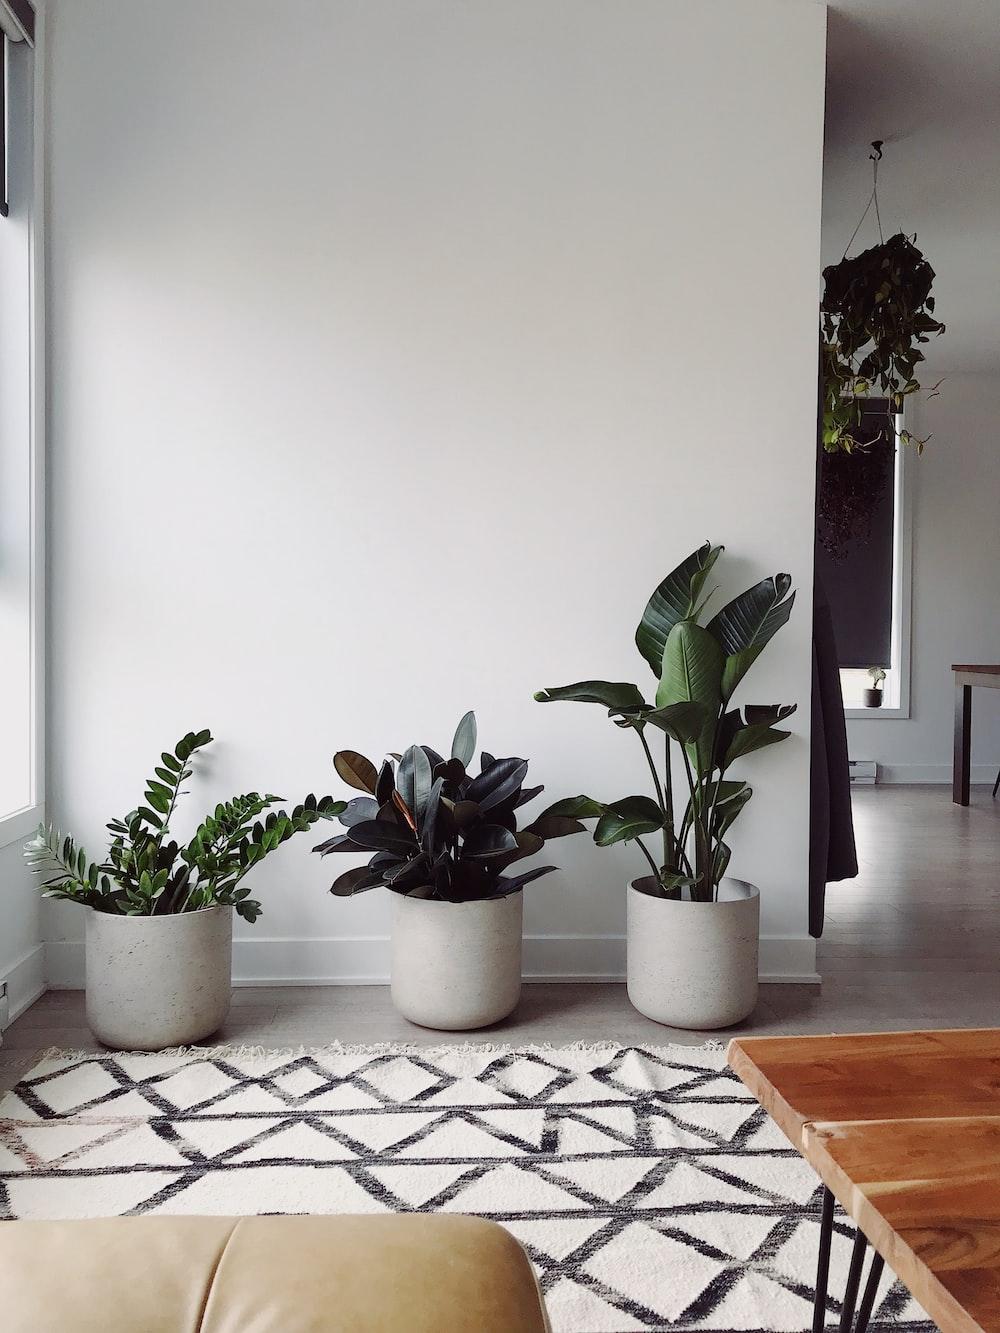 three green-leafed plants